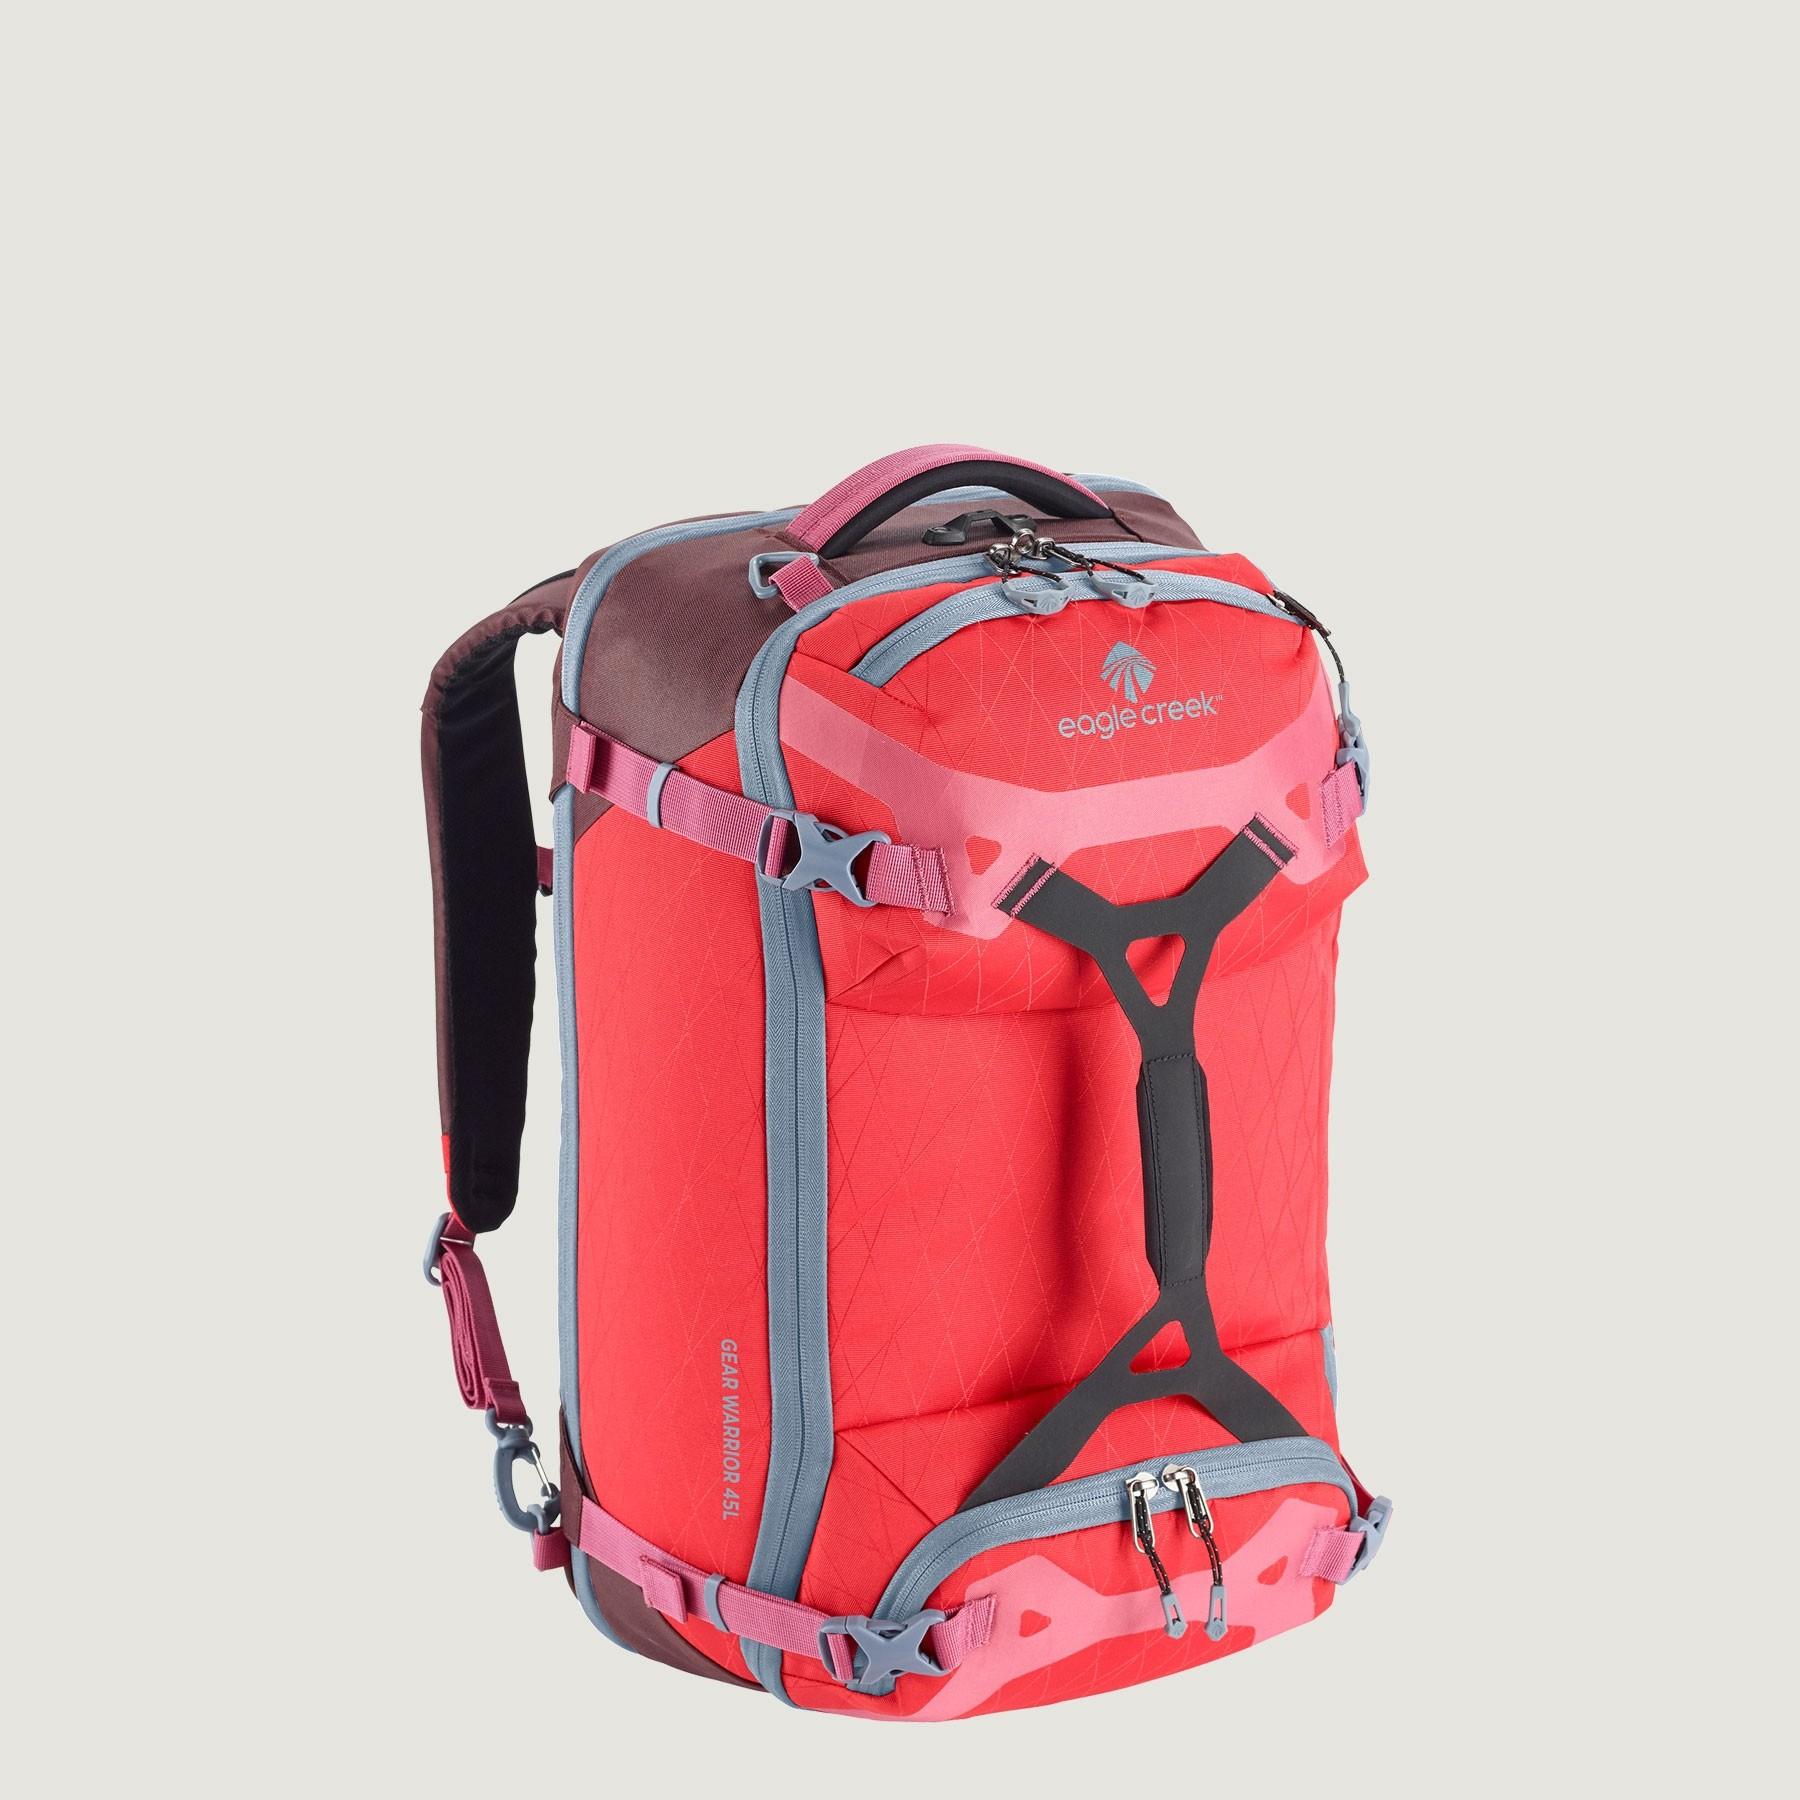 Gear Warrior Travel Pack 45L